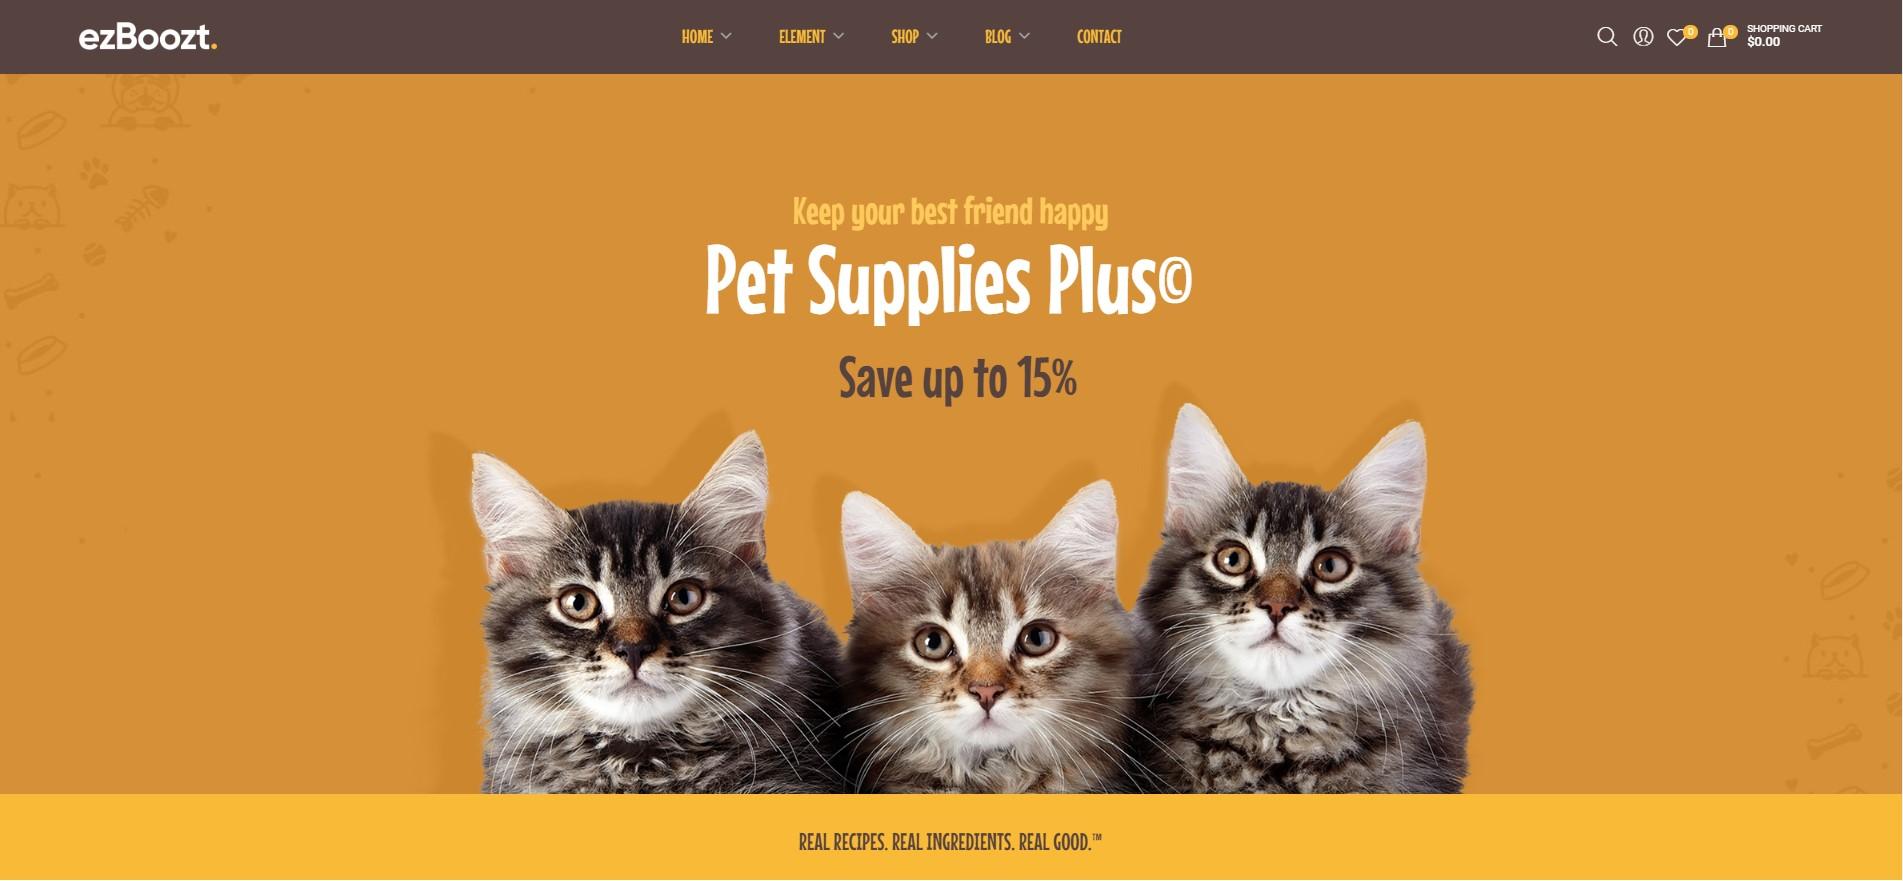 ezBoozt - All-in-one WordPress Theme - Pet Shop Demo